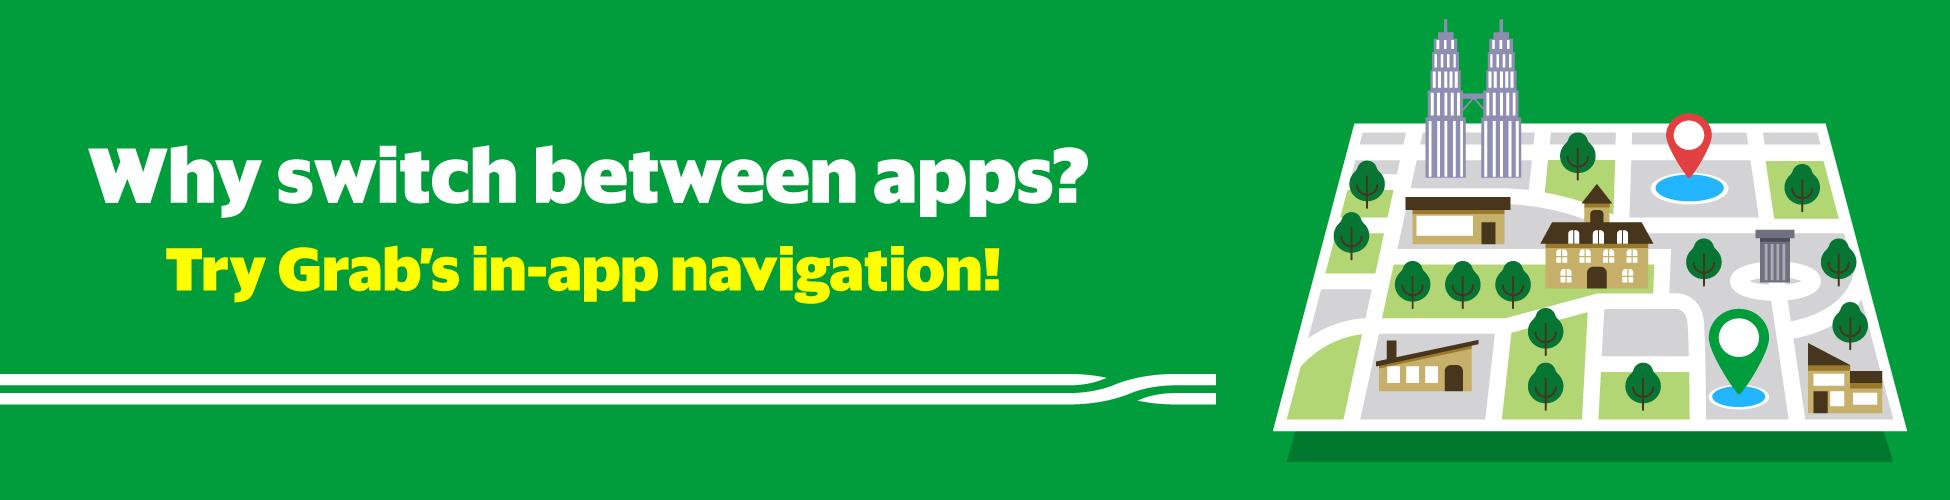 Introducing Grab's in-app navigation for Grab Drivers | Grab MY